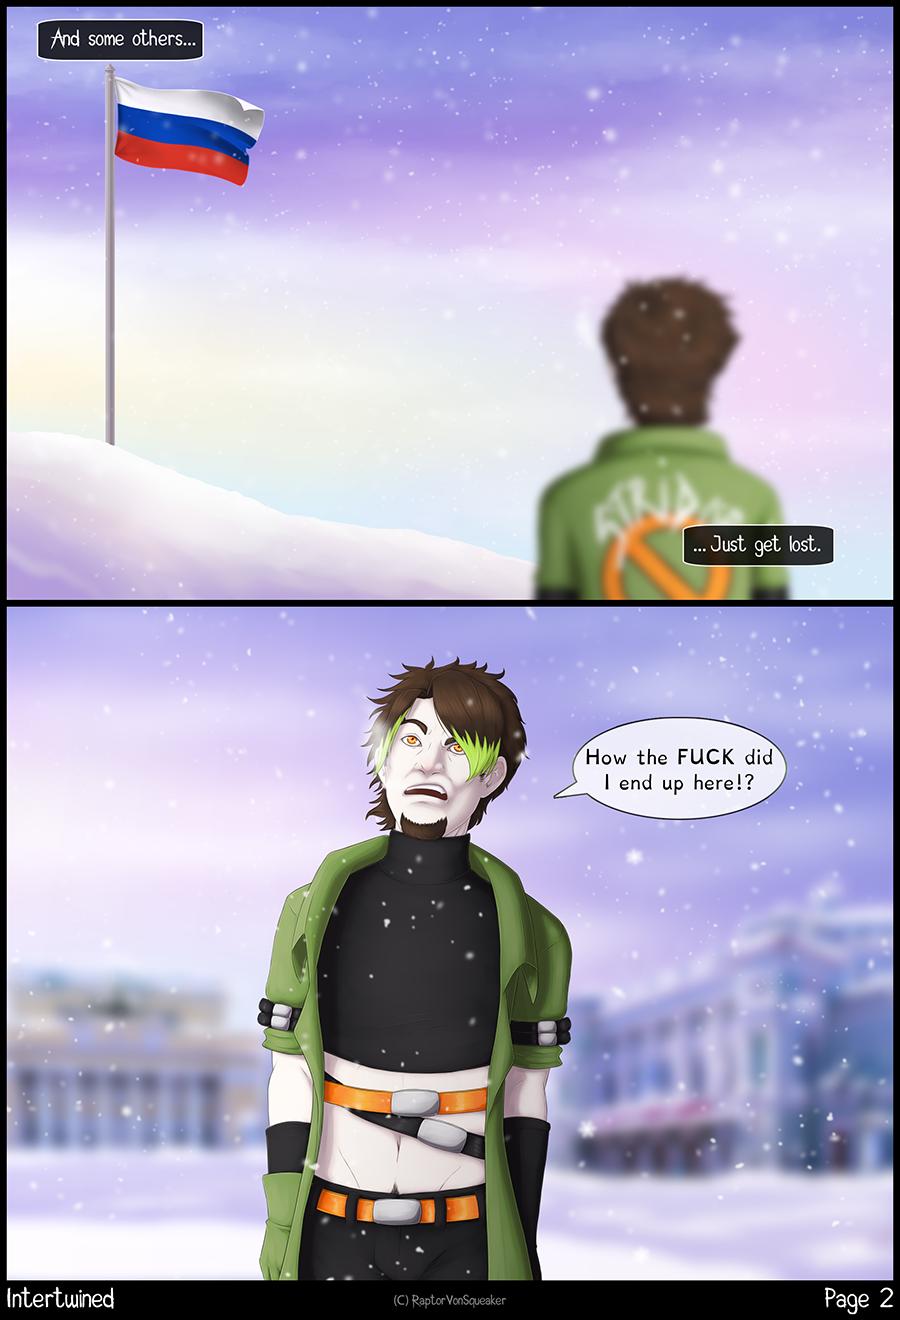 Page 2 - Got lost.